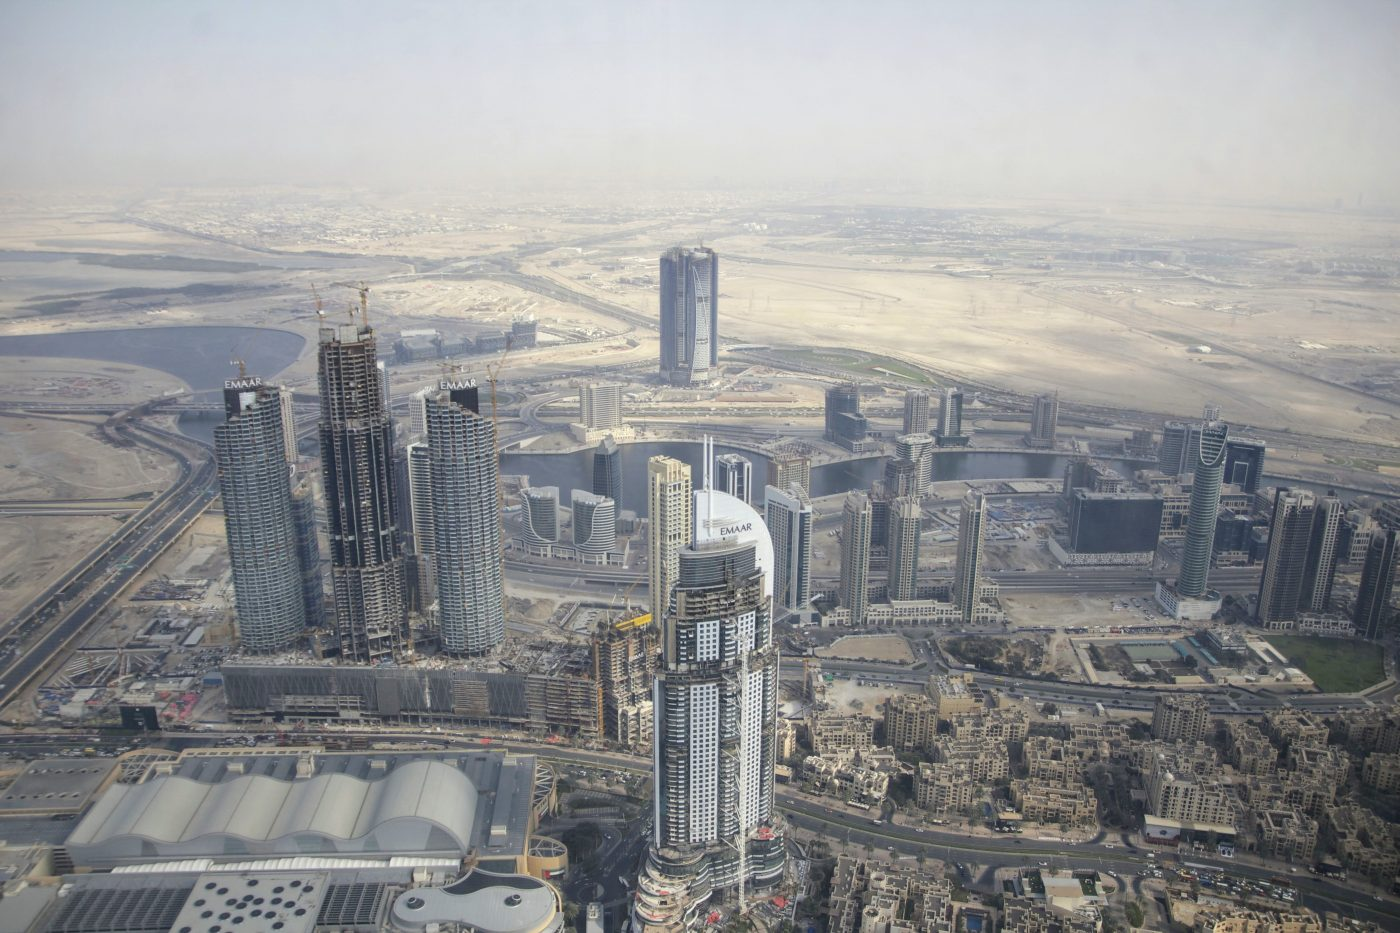 View Top of the Burj Kalifa